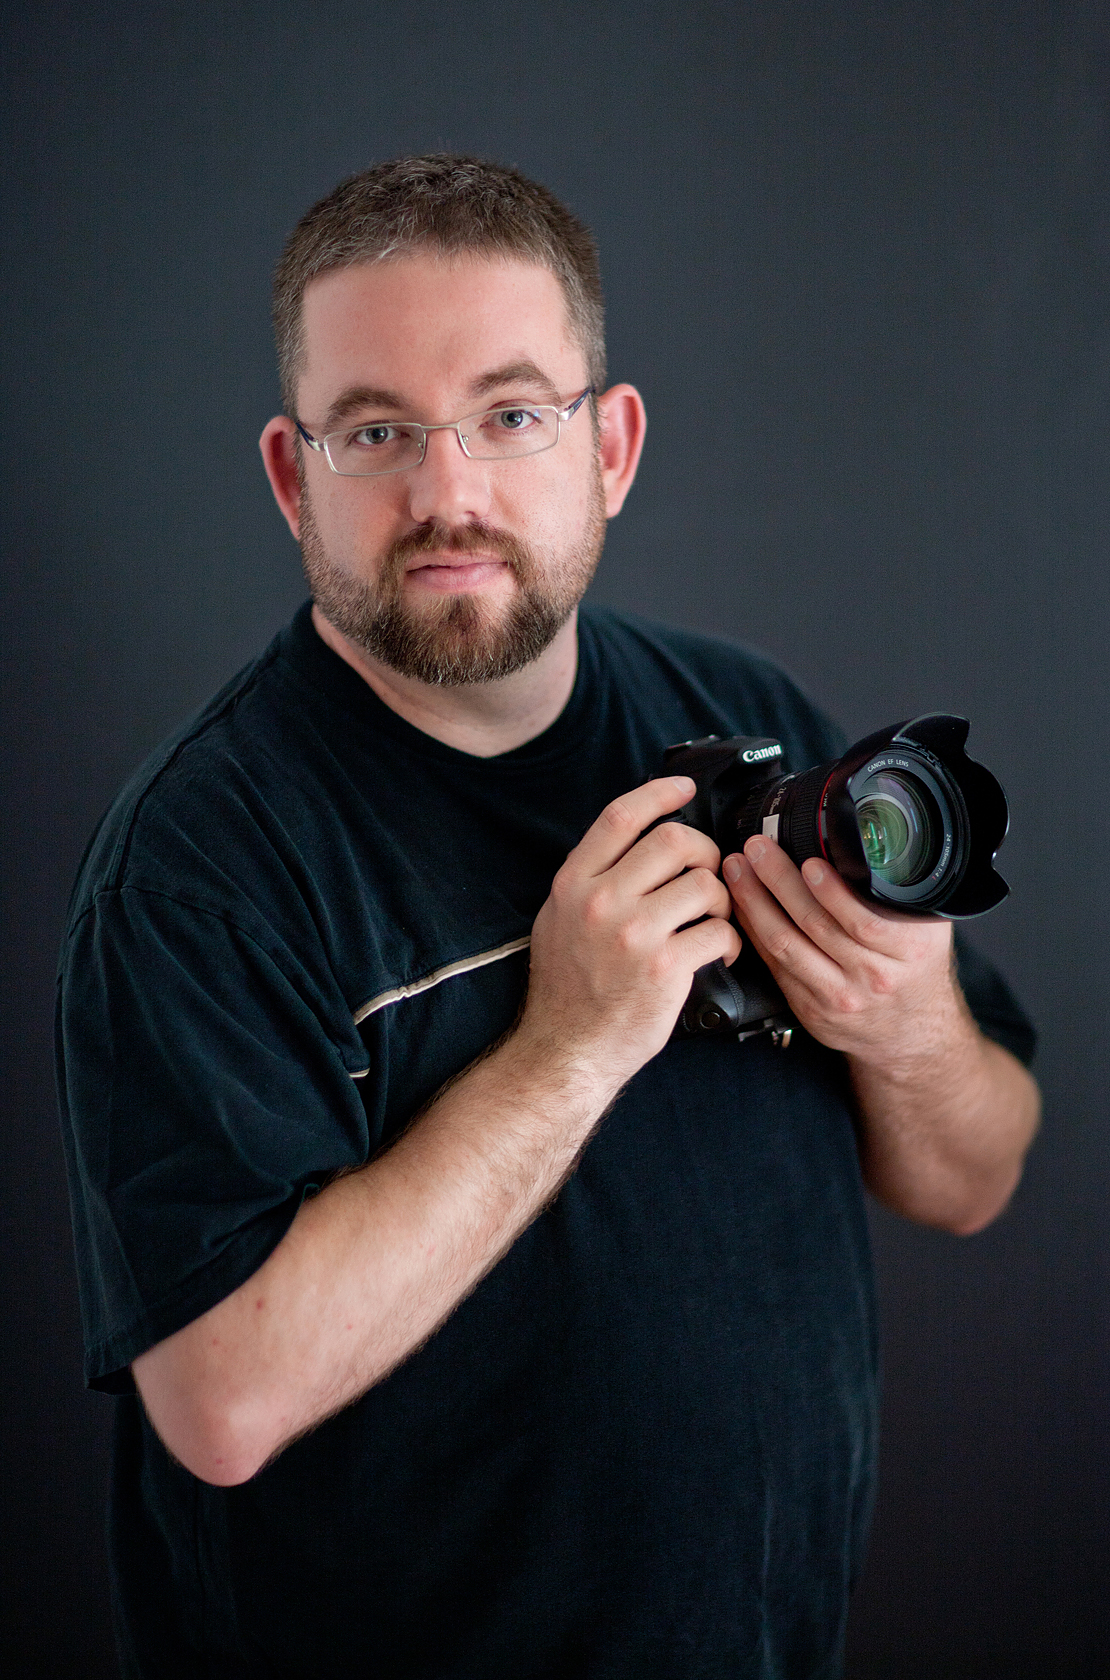 Photographer: Pete Arnold